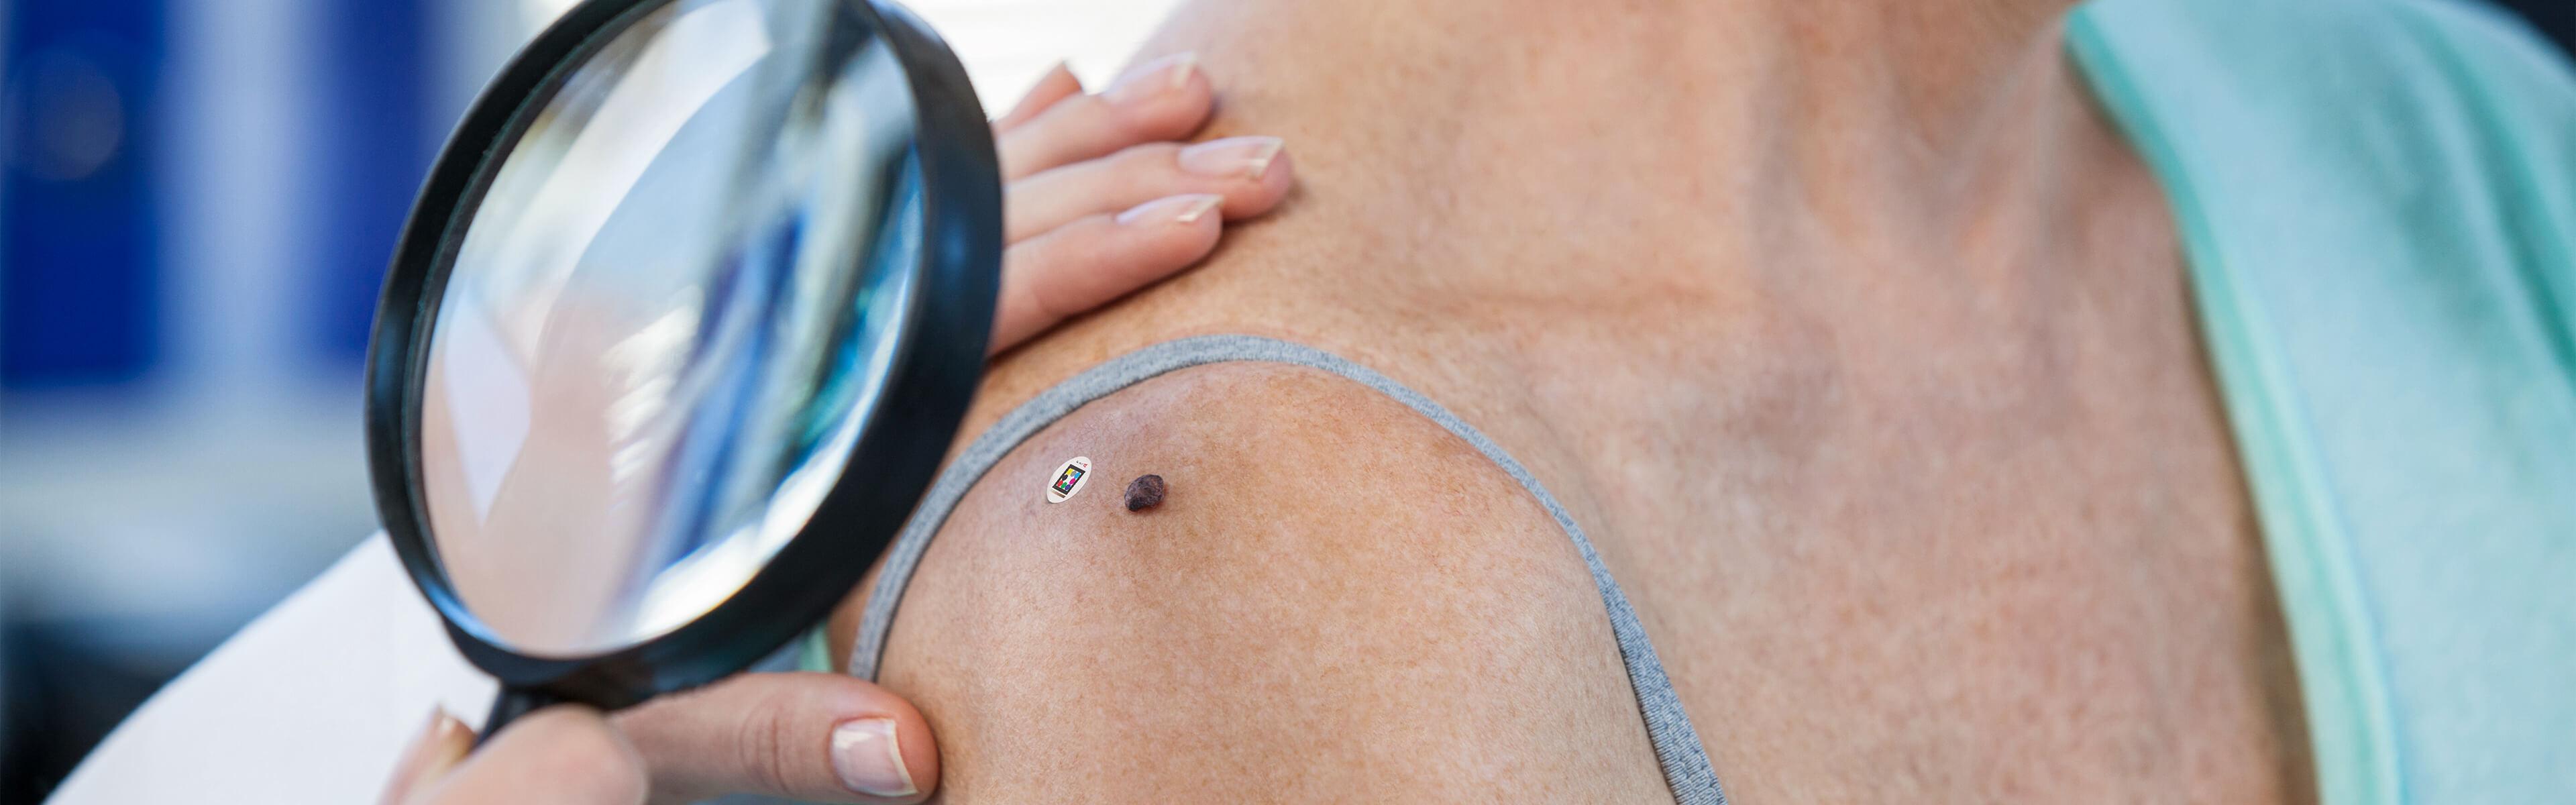 Digital standardized documentation and assessment of non-melanoma related skin changes